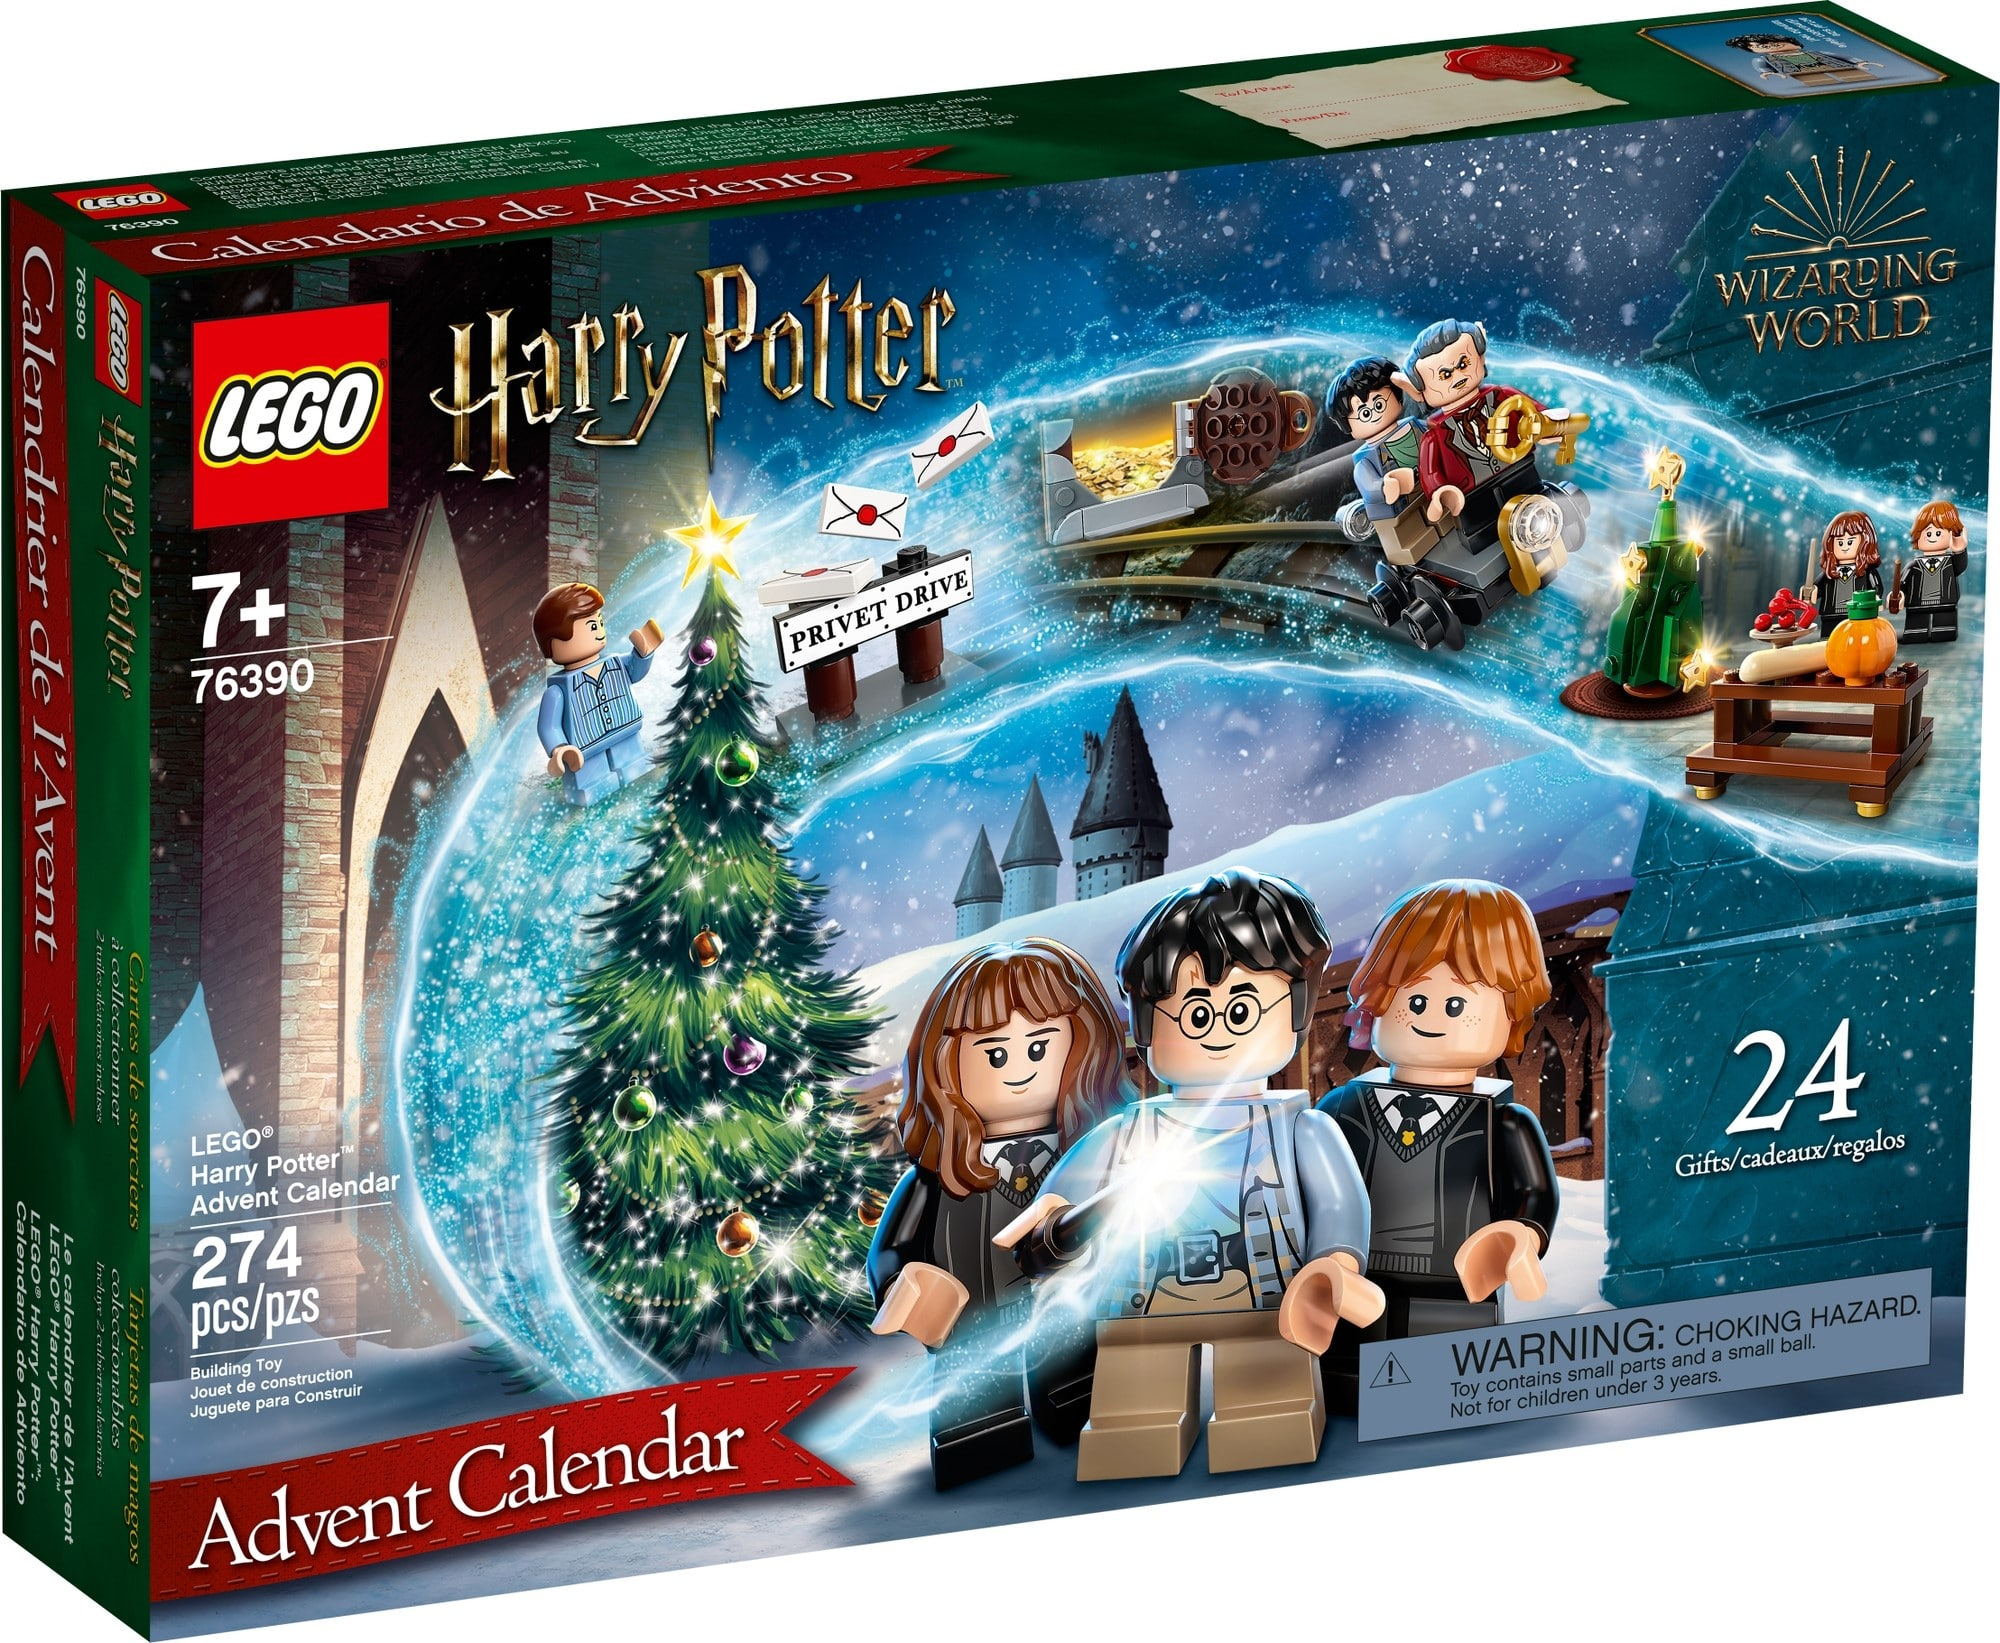 LEGO Harry Potter 76390 LEGO Harry Potter Adventskalender 2